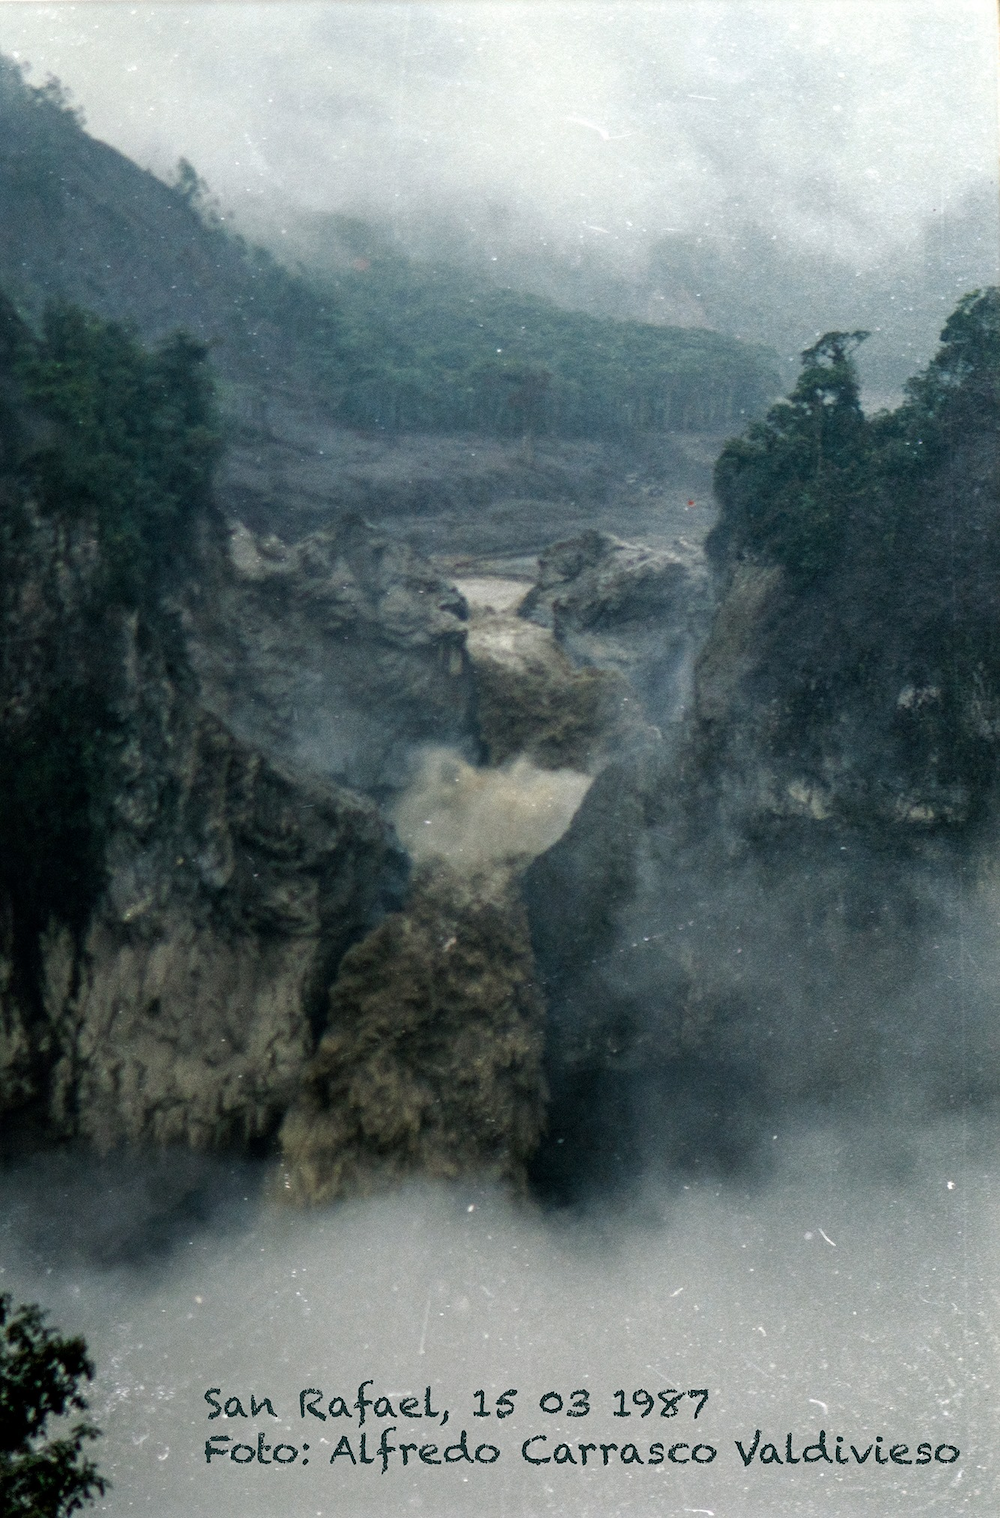 Cascada San Rafael. La cascada San Rafael después del sismo de marzo de 1987. Foto: Alfredo Carrasco.